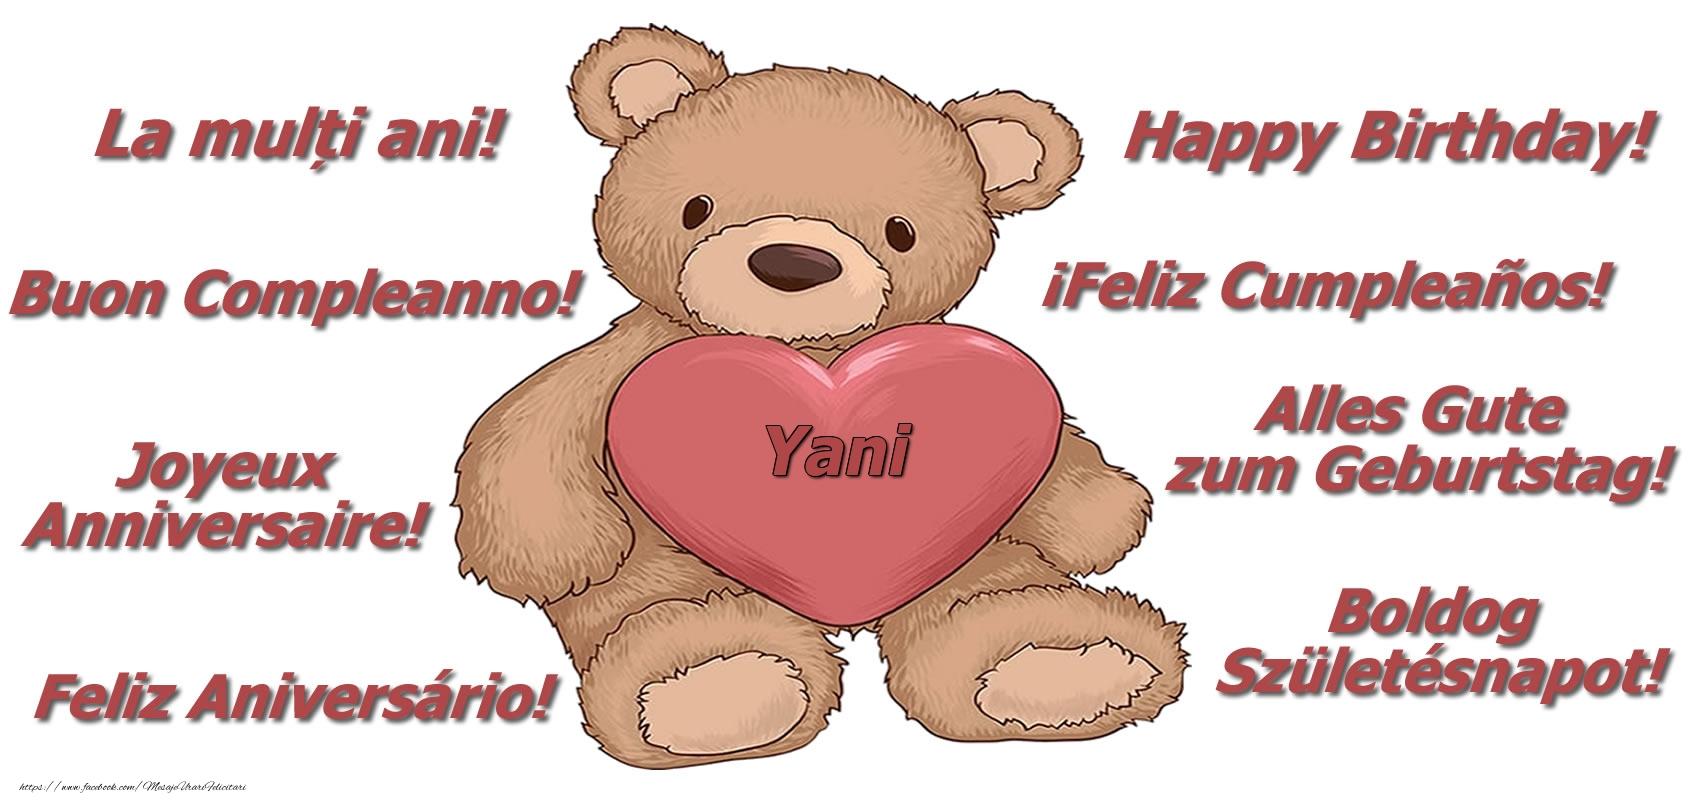 Felicitari de zi de nastere - La multi ani Yani! - Ursulet